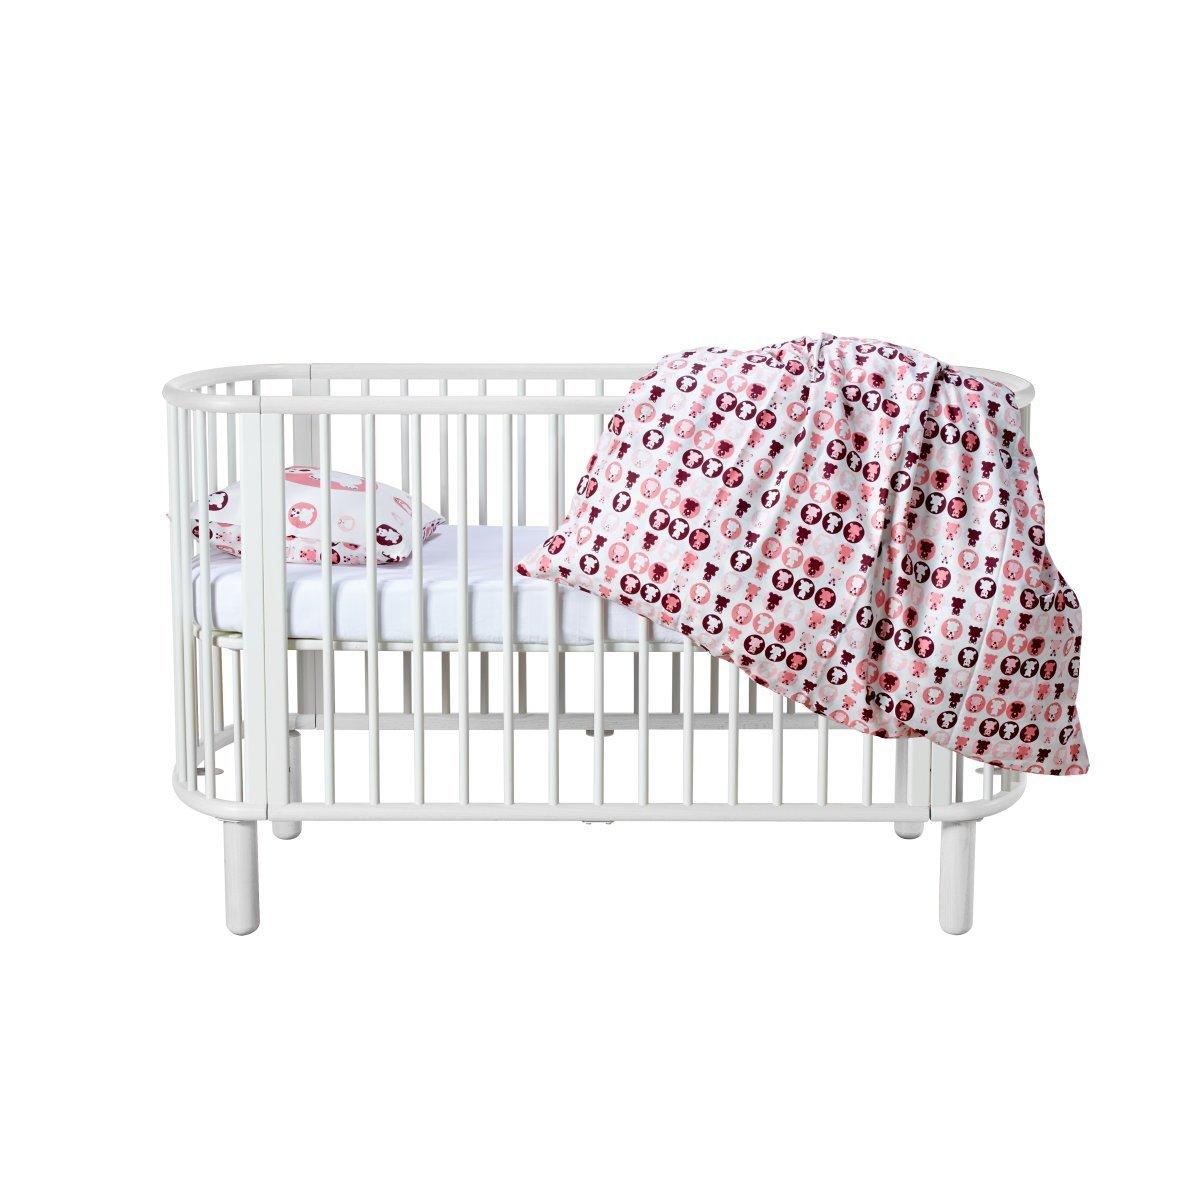 flexa babybett 70x140 buche wei 80 17801 40 611. Black Bedroom Furniture Sets. Home Design Ideas